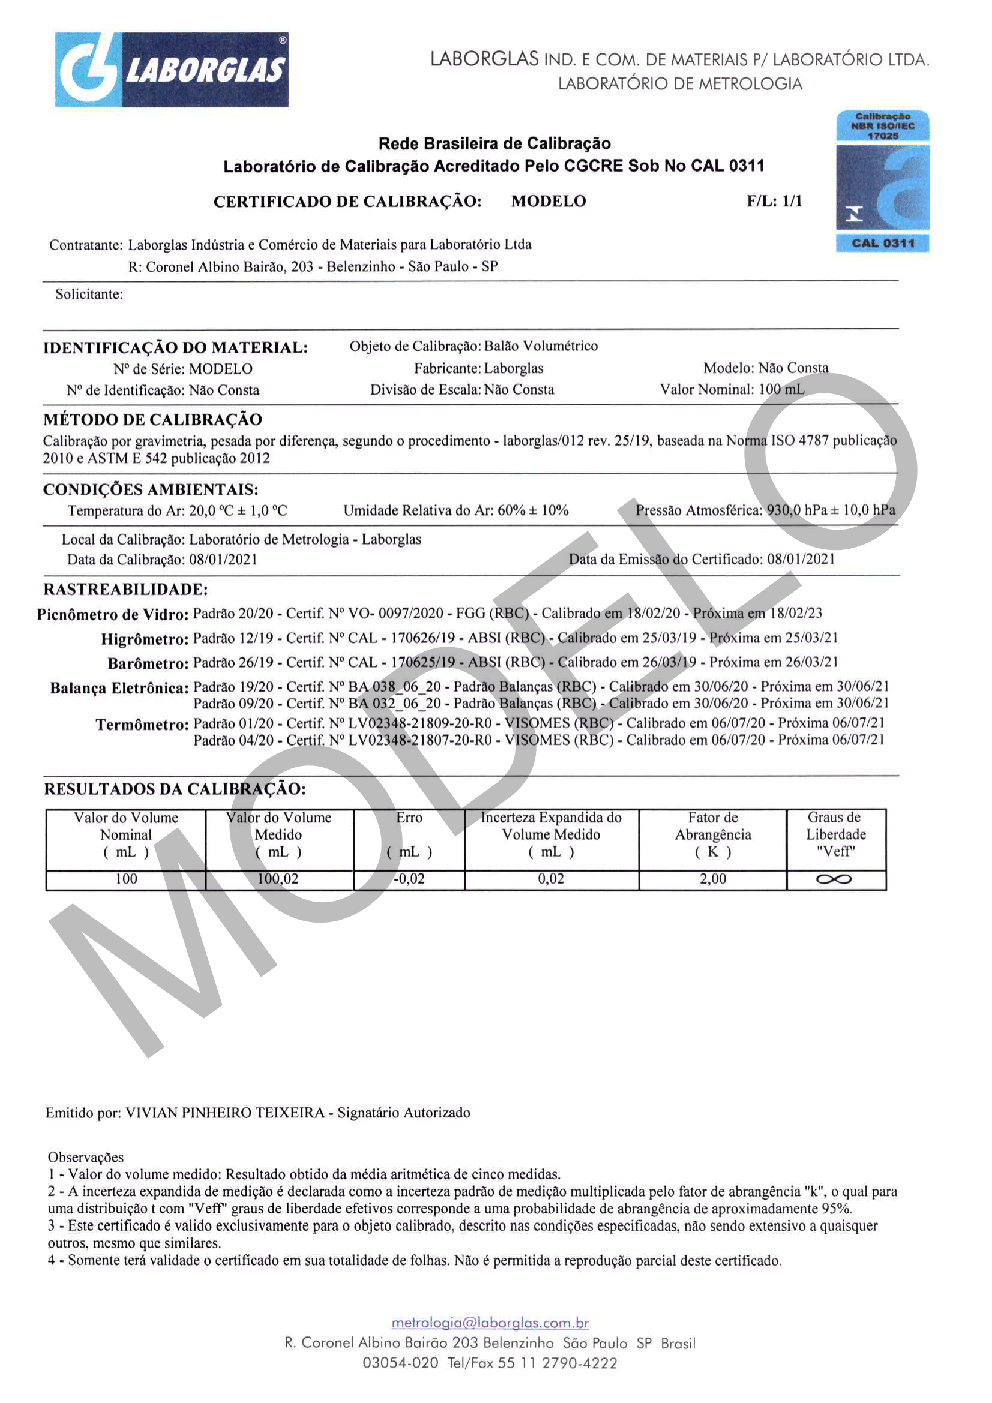 BALÃO VOLUMÉTRICO CLASSE A ROLHA POLI C/ CERTIFICADO RBC 100 ML - Marca Laborglas - Cód. 9167824-R